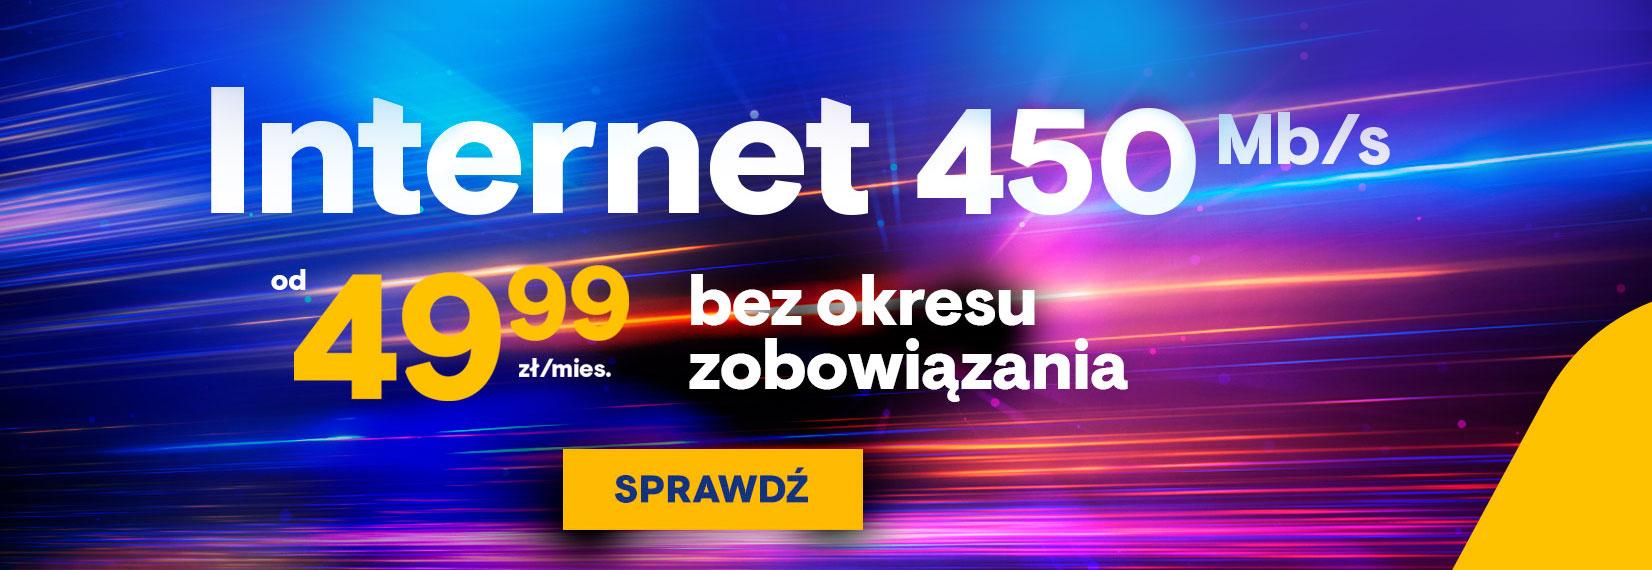 Internet 450 Mb/s